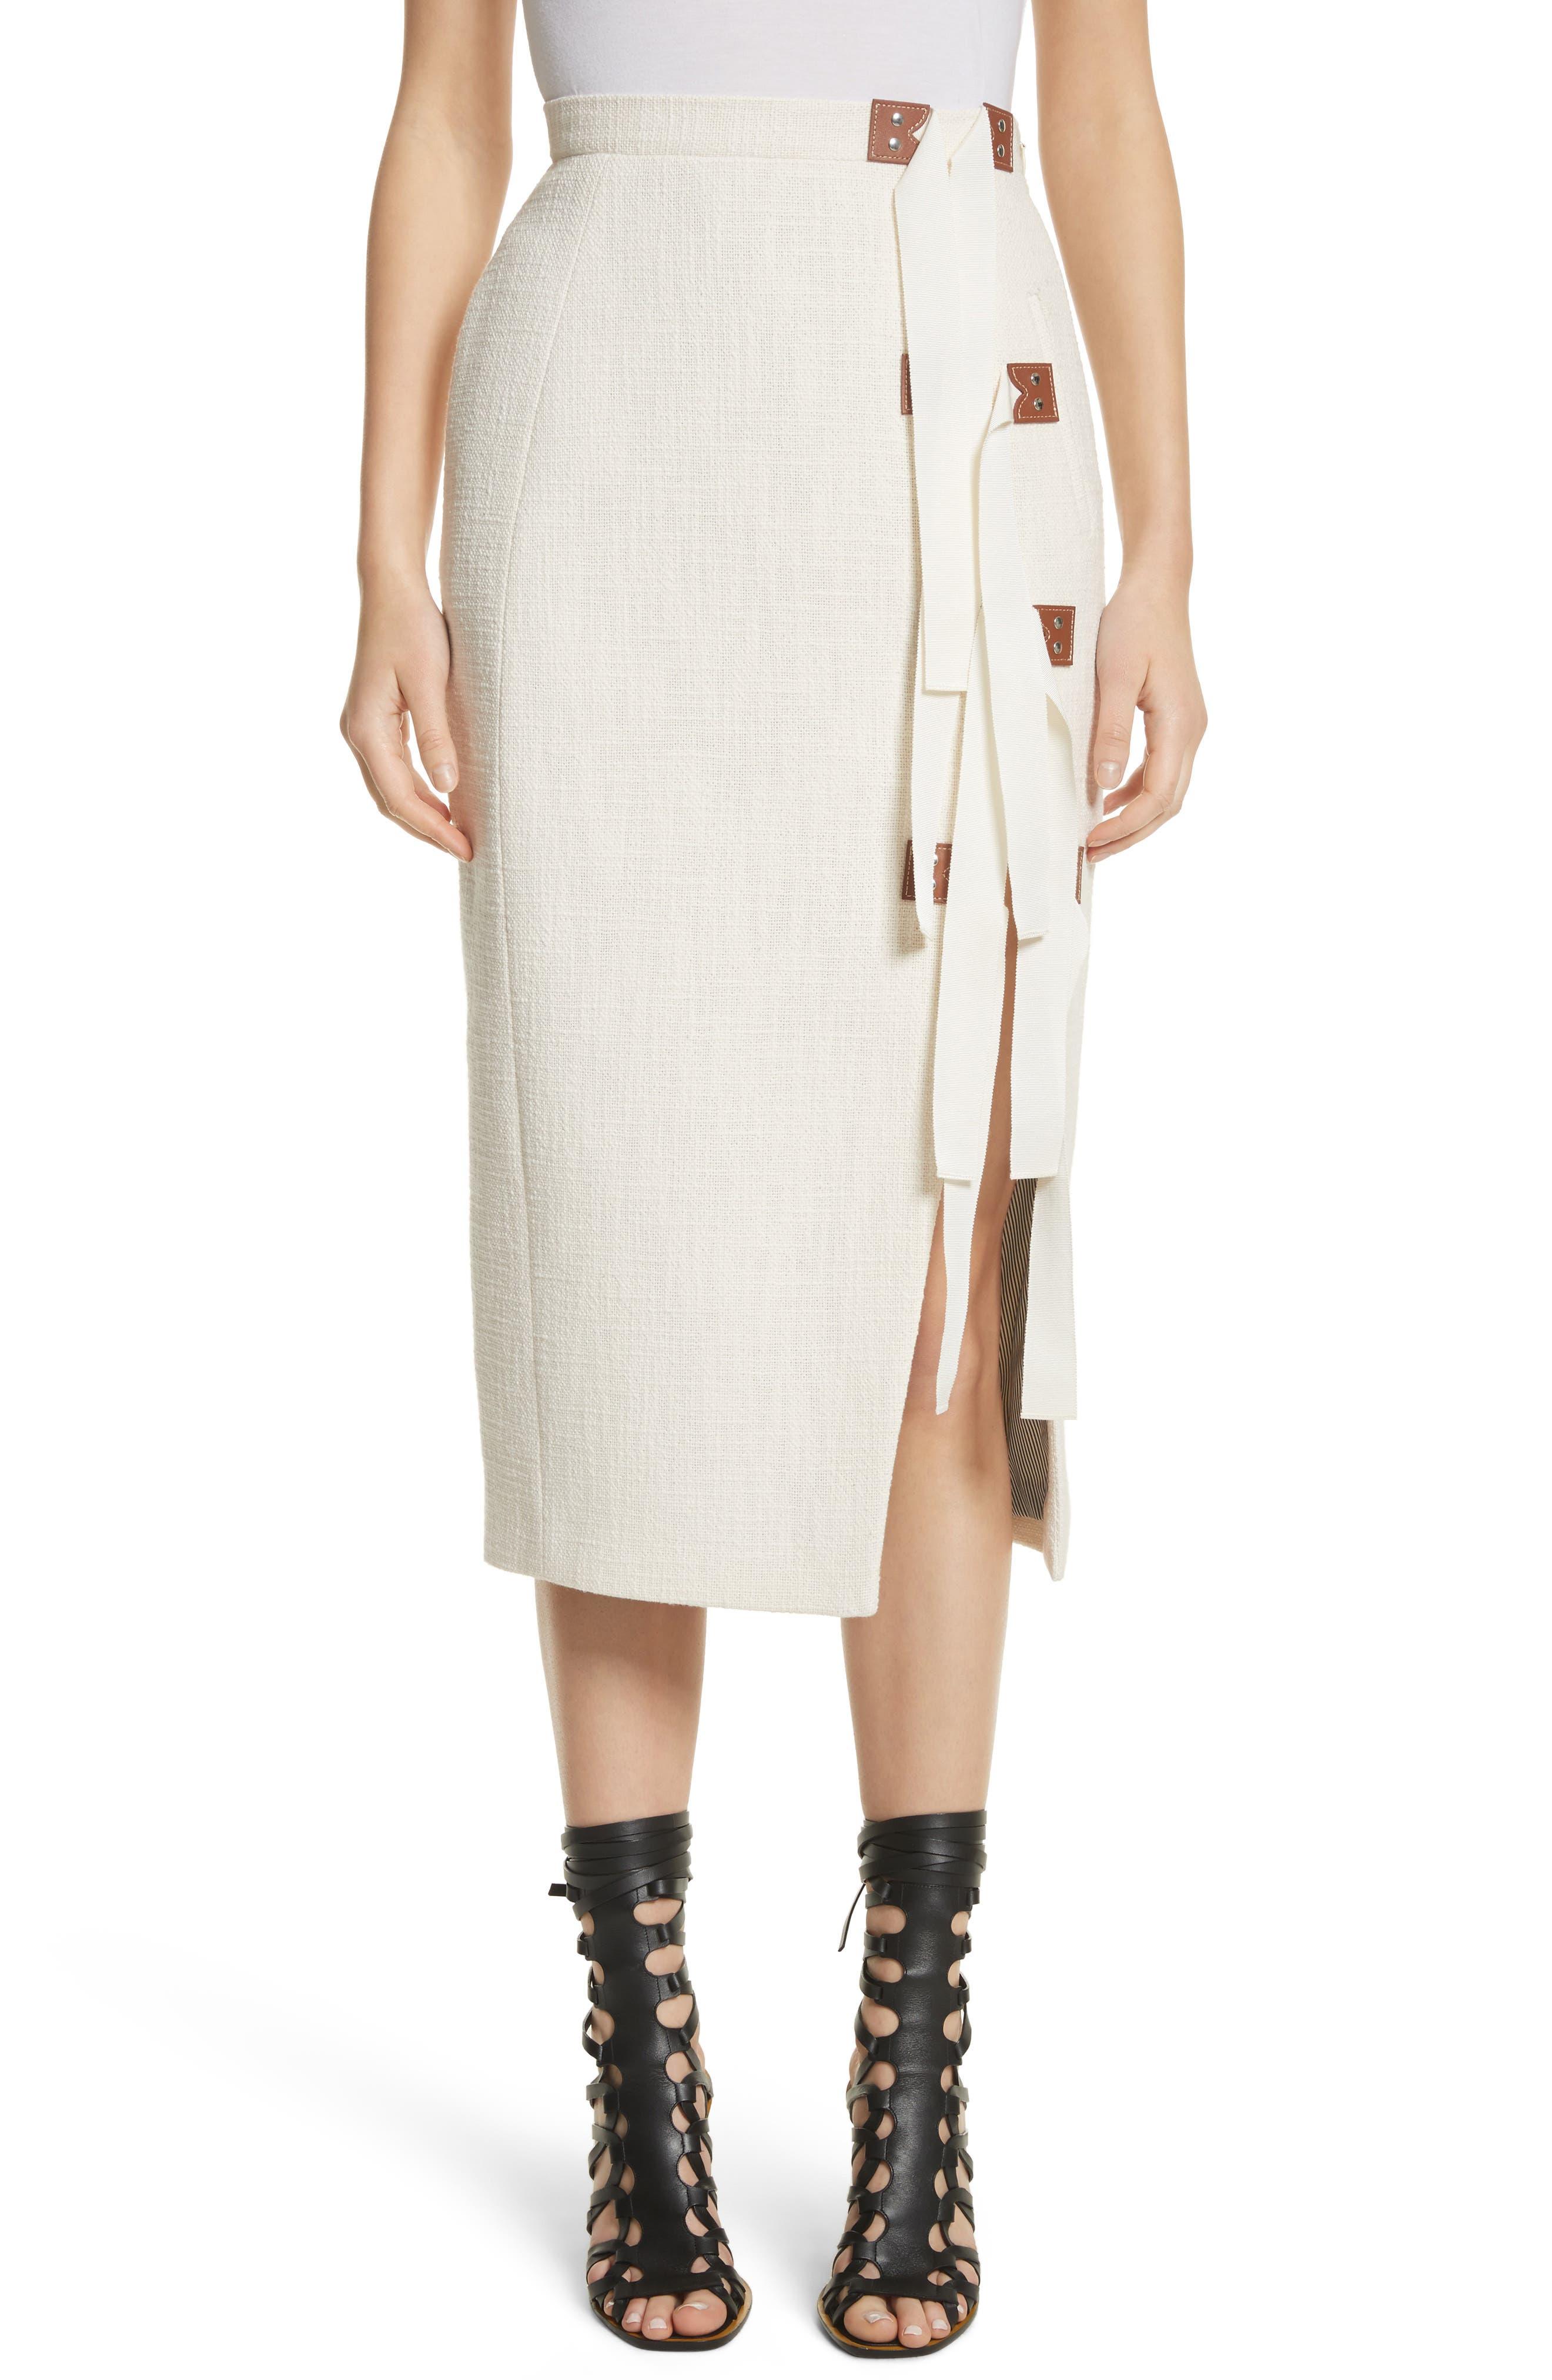 Altuzarra Ribbon Detail Tweed Pencil Skirt